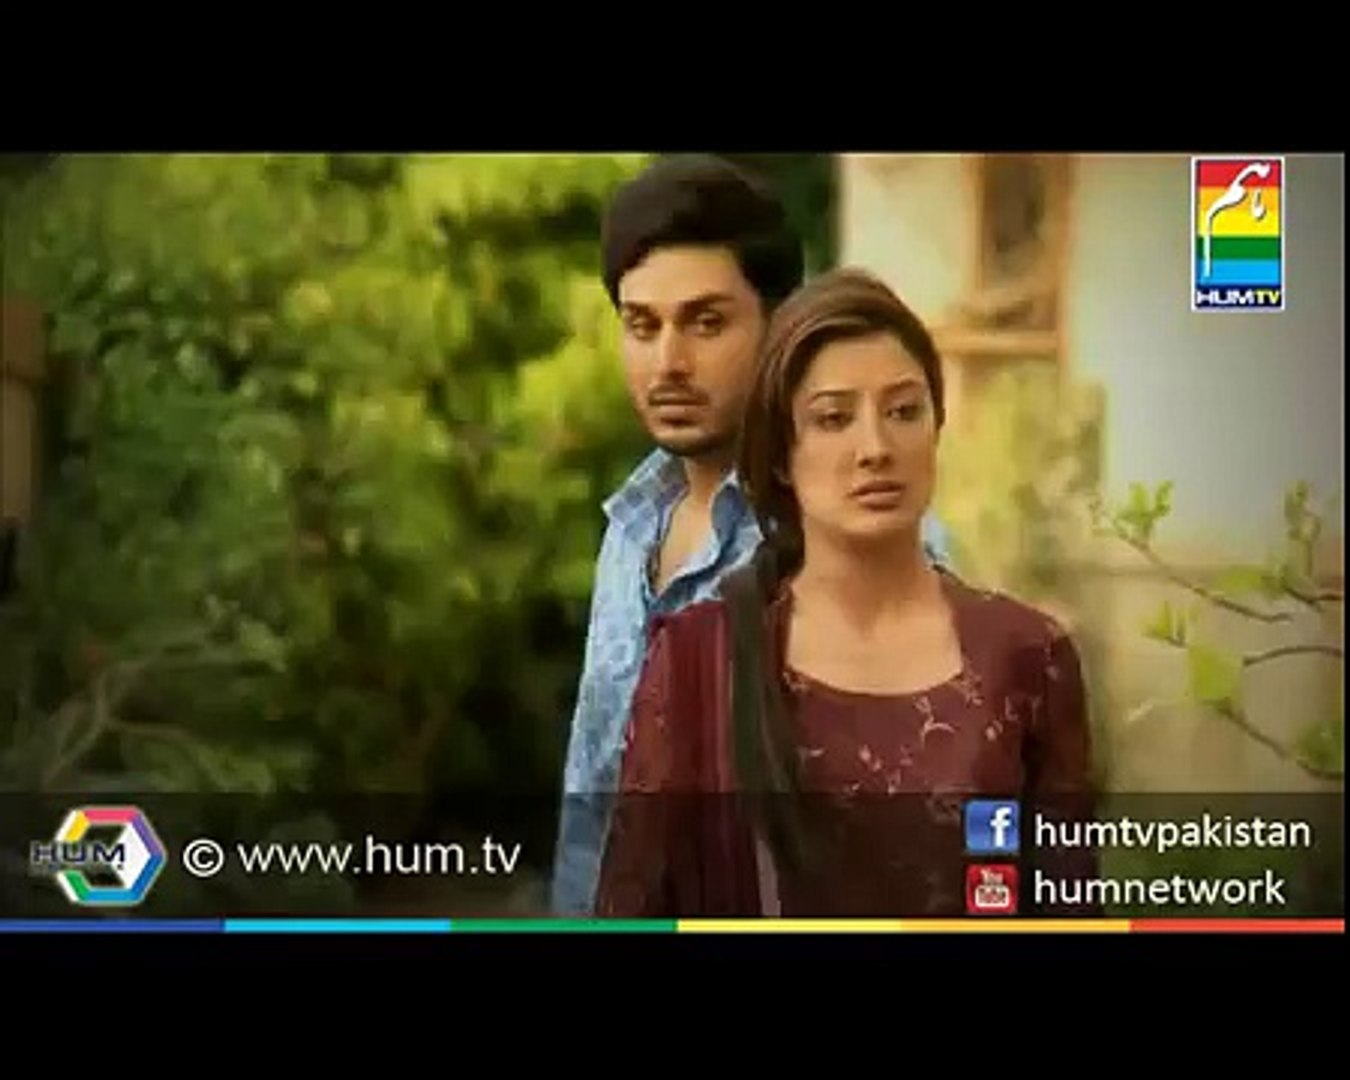 Meray Qatil Meray Dildar - Episode 14 - Hum Tv Network Drama Series